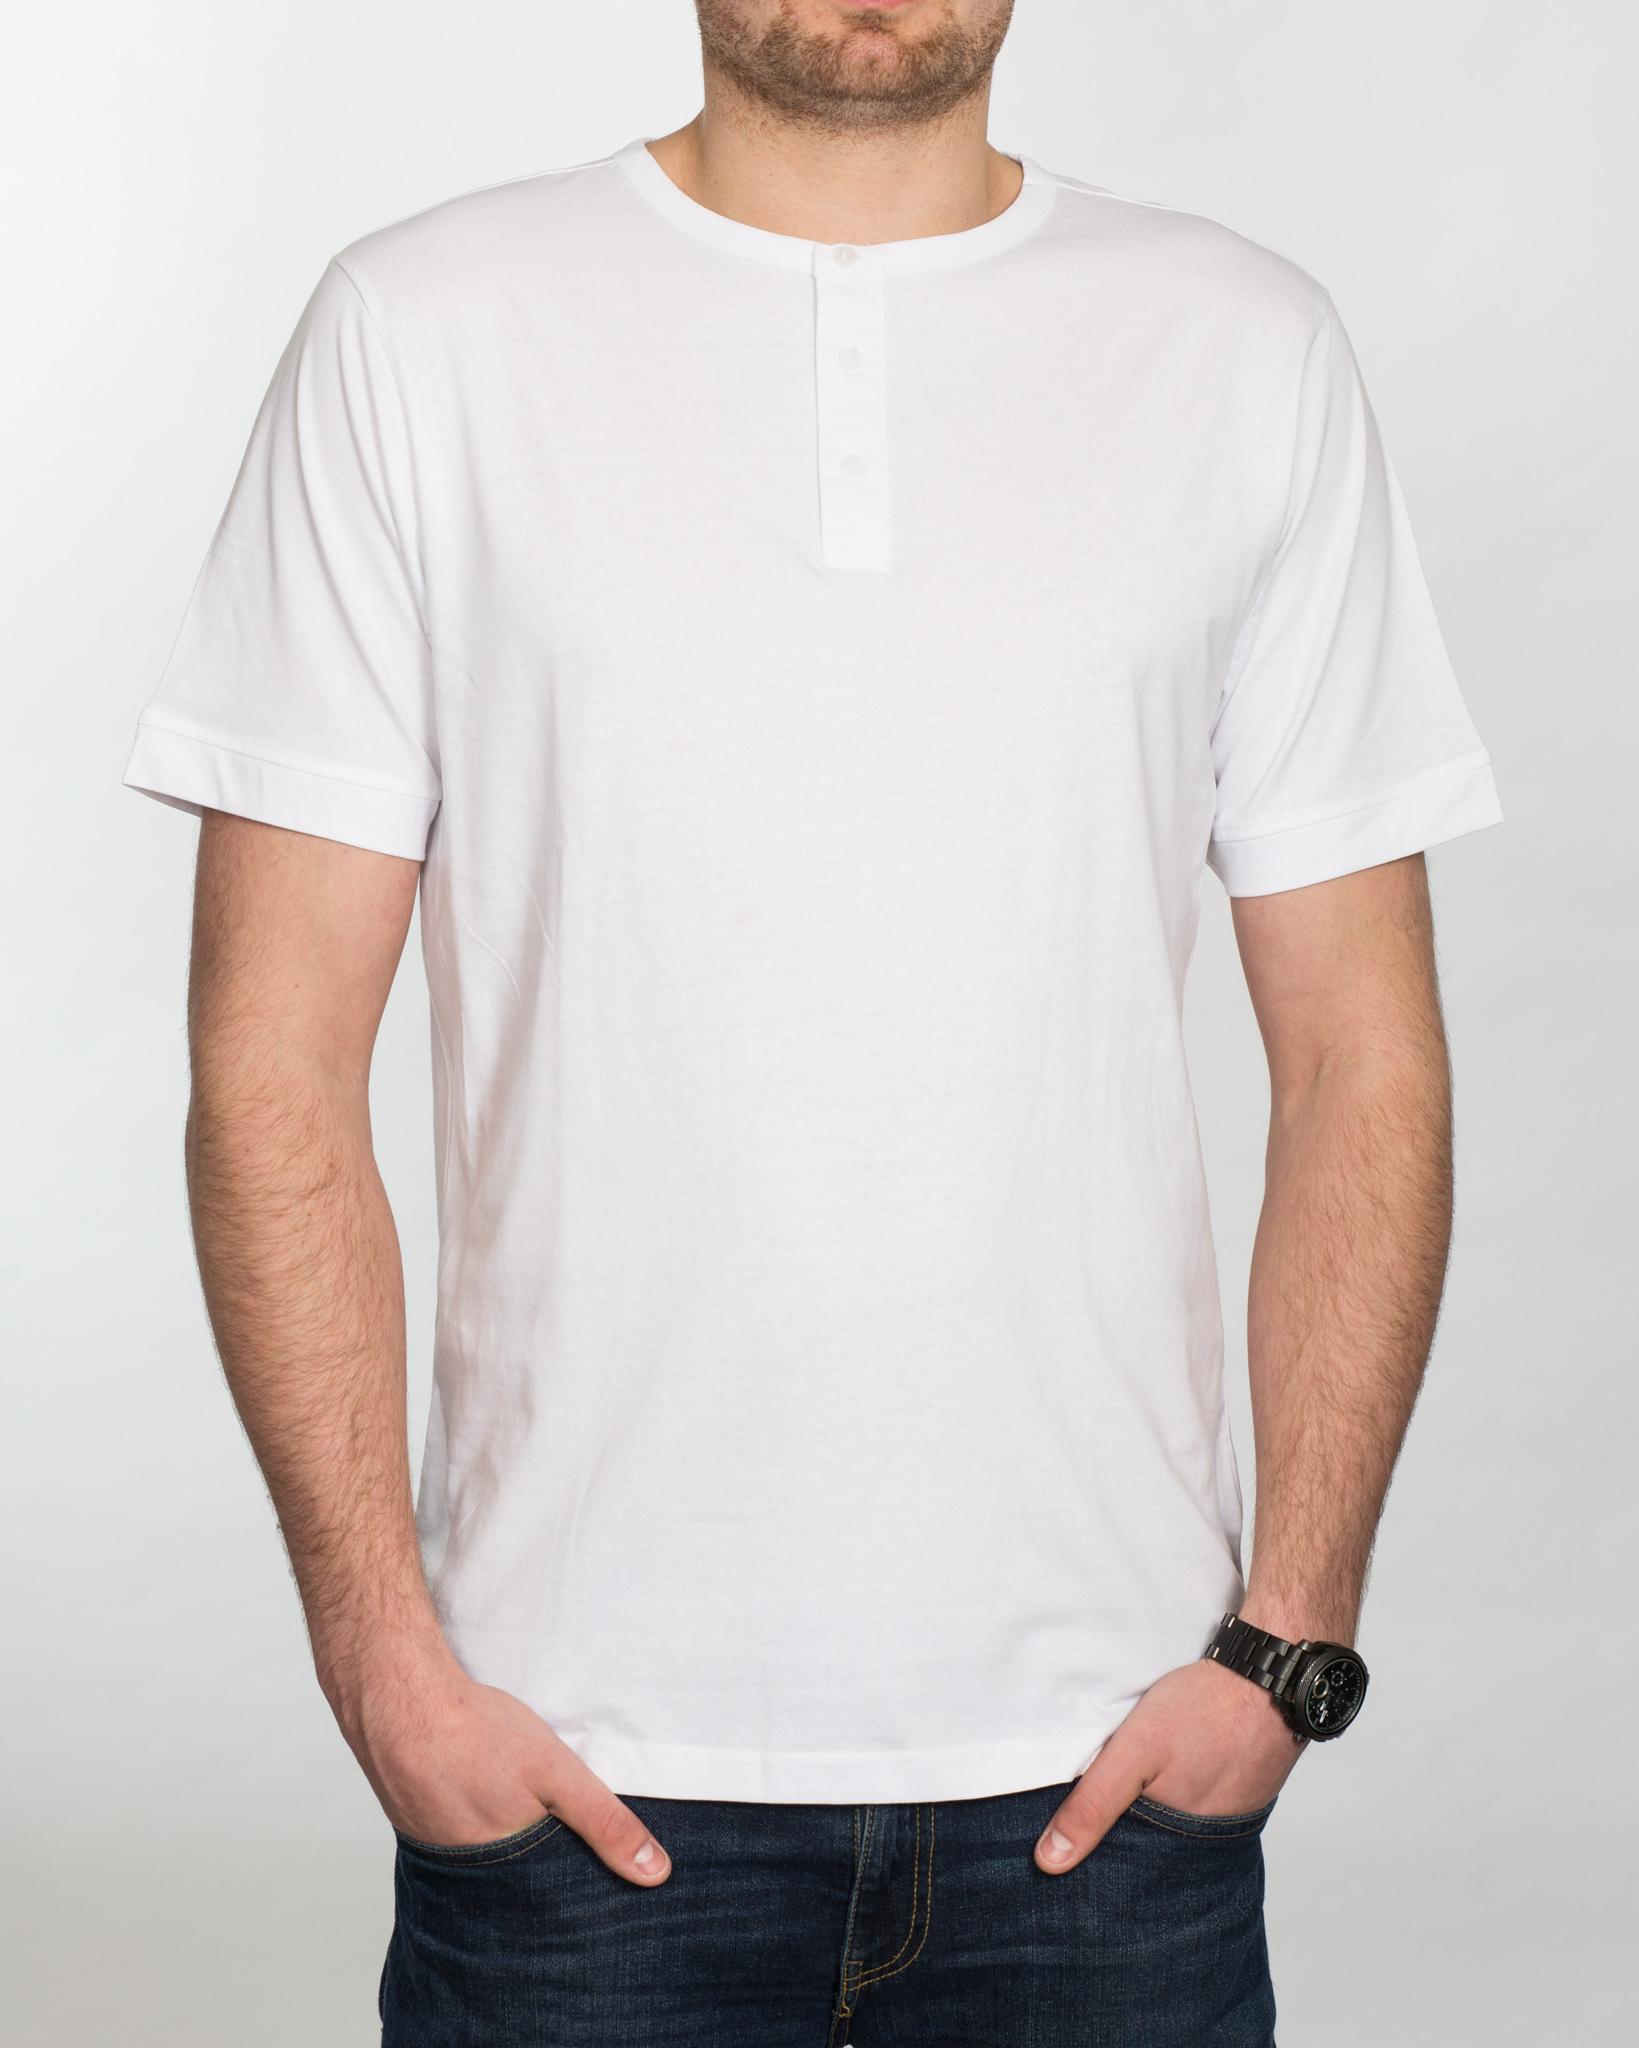 Replica Grandad Shirt (white)